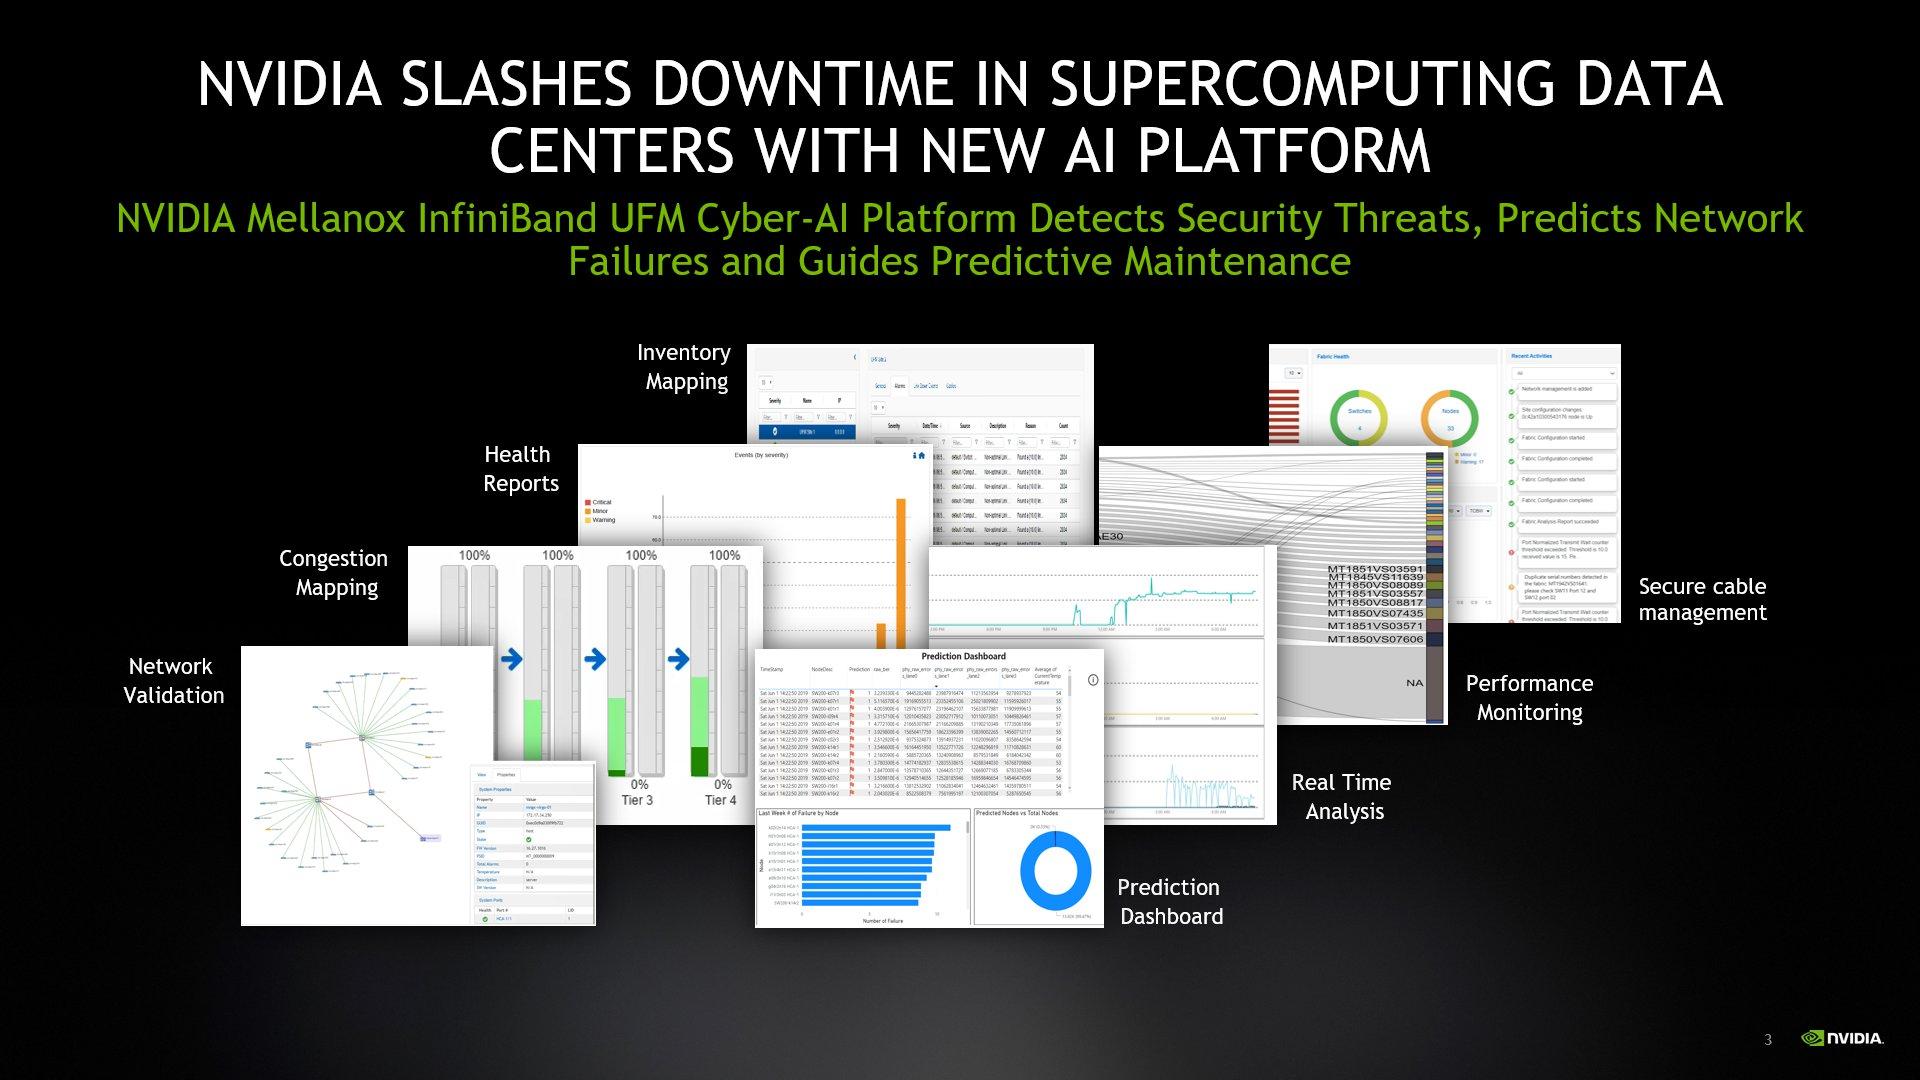 NVIDIA Mellanox UFM Cyber-AI最大限度地减少超级计算数据中心的停机时间